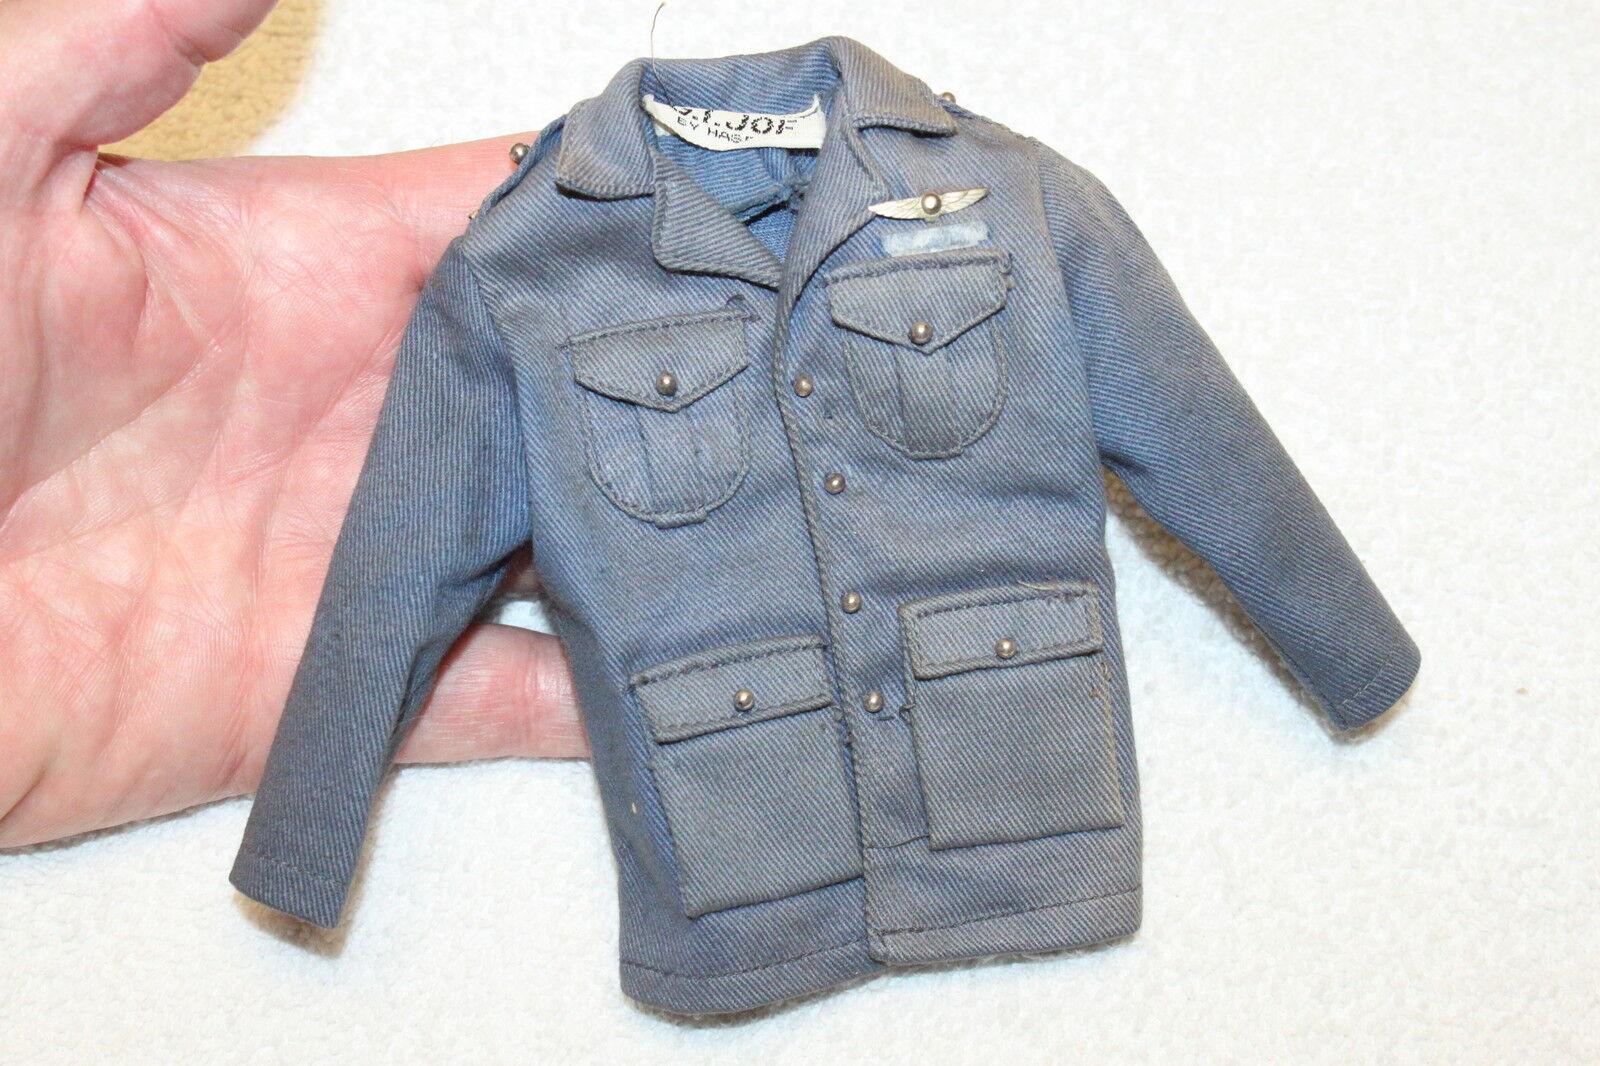 Vintage GI Joe Action Pilot - Dress Uniform - Wings & Bars - No Country Tag